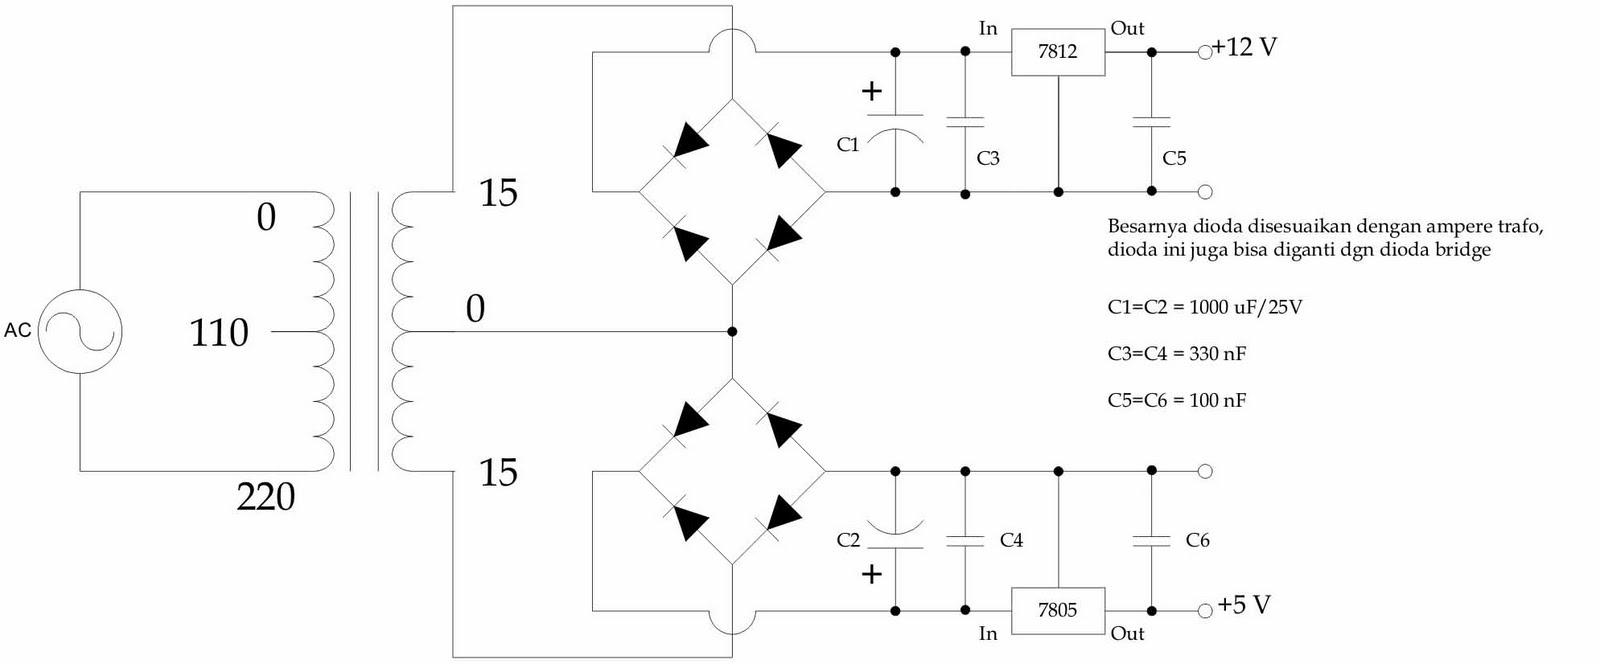 my room schematic diagram power supply dual output 12v 5v. Black Bedroom Furniture Sets. Home Design Ideas